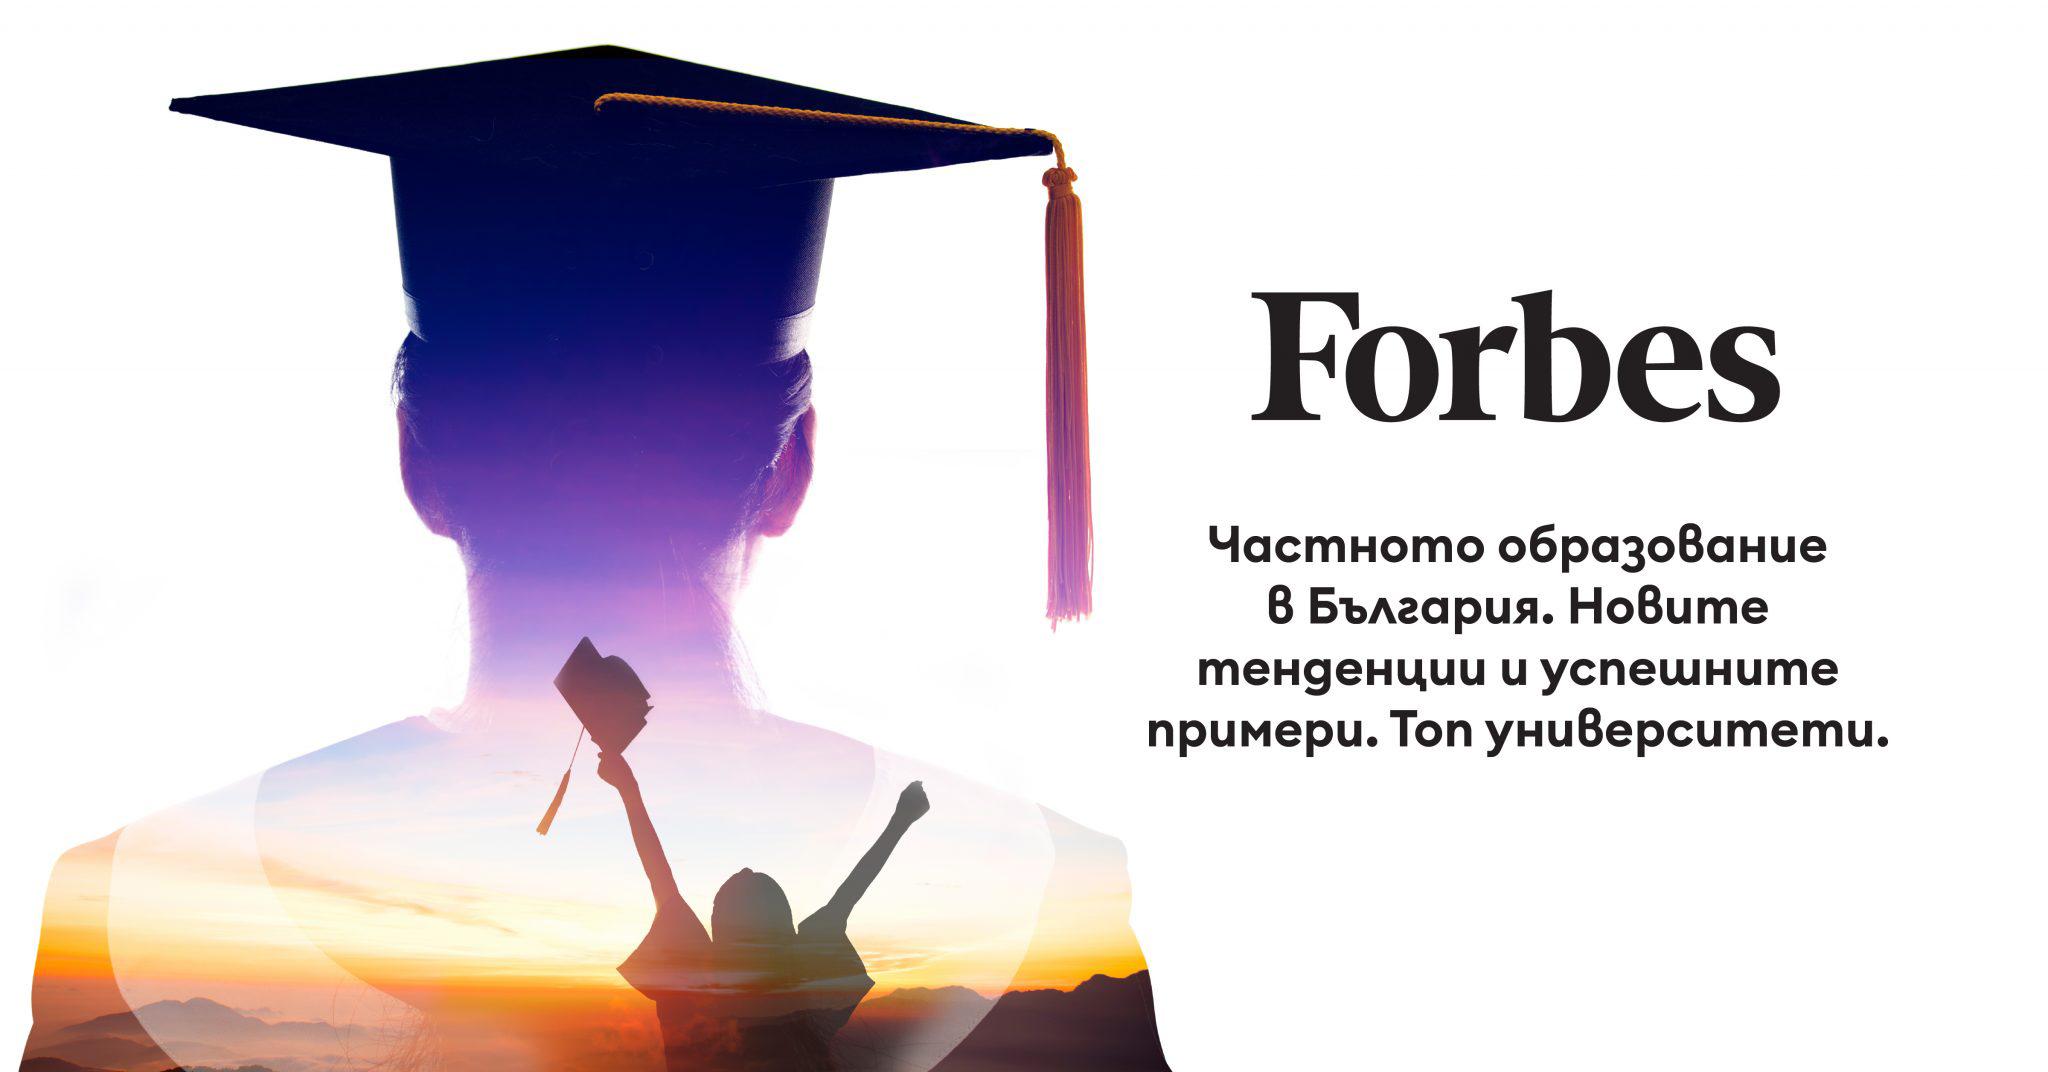 01_Website-Education-1200-x-628-@4x-2048x1072